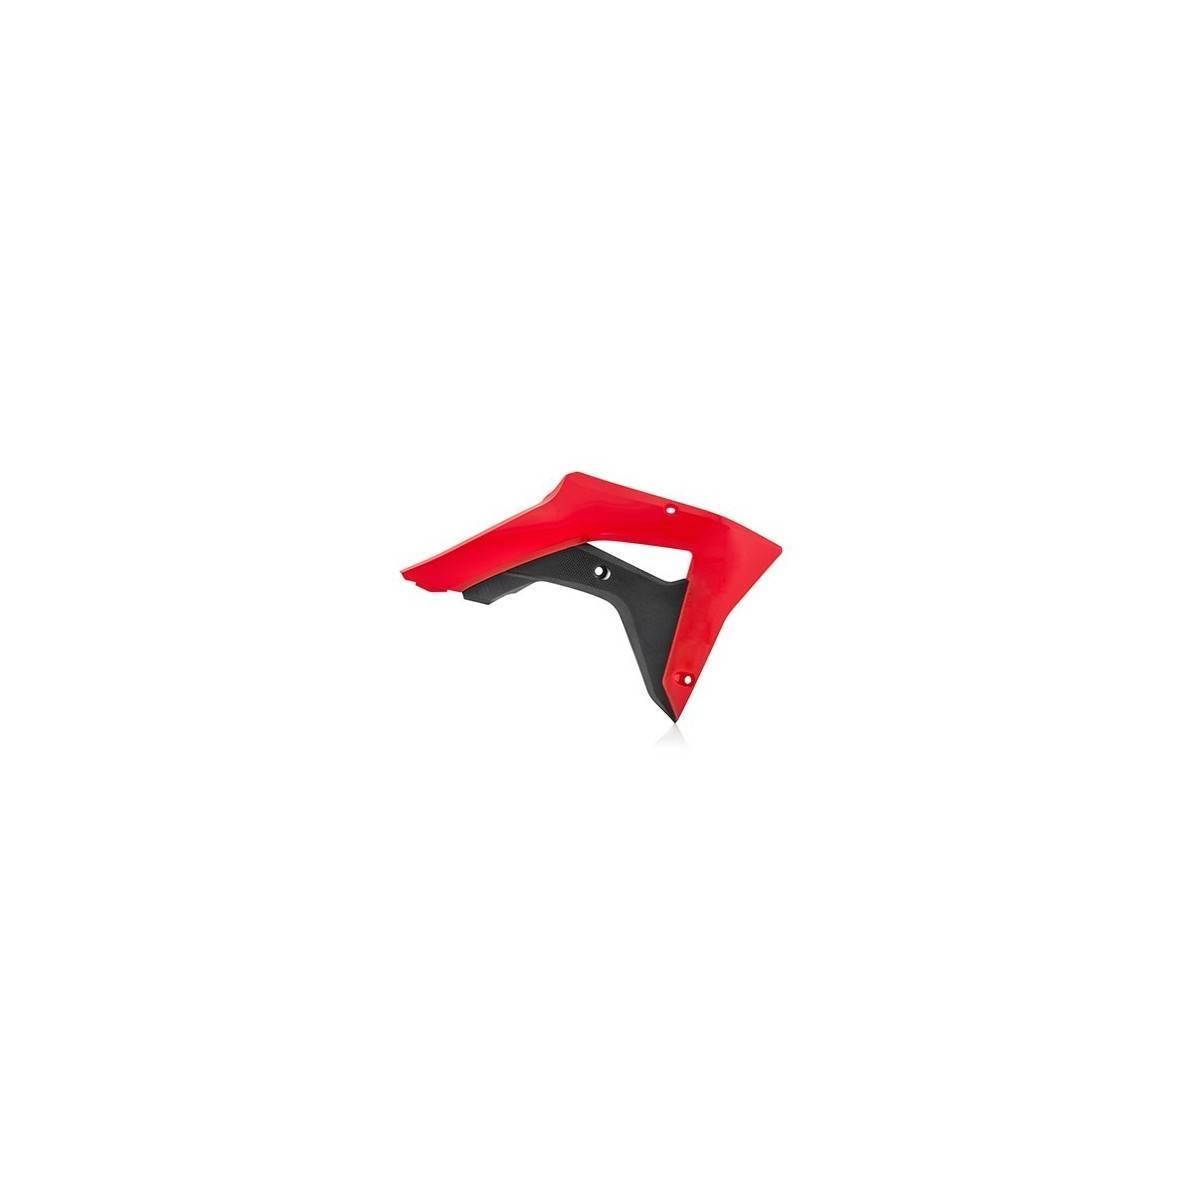 0022529-349 - Tapa Radiador Acerbis Honda Crf450Rx 17 18 Rojo Negro